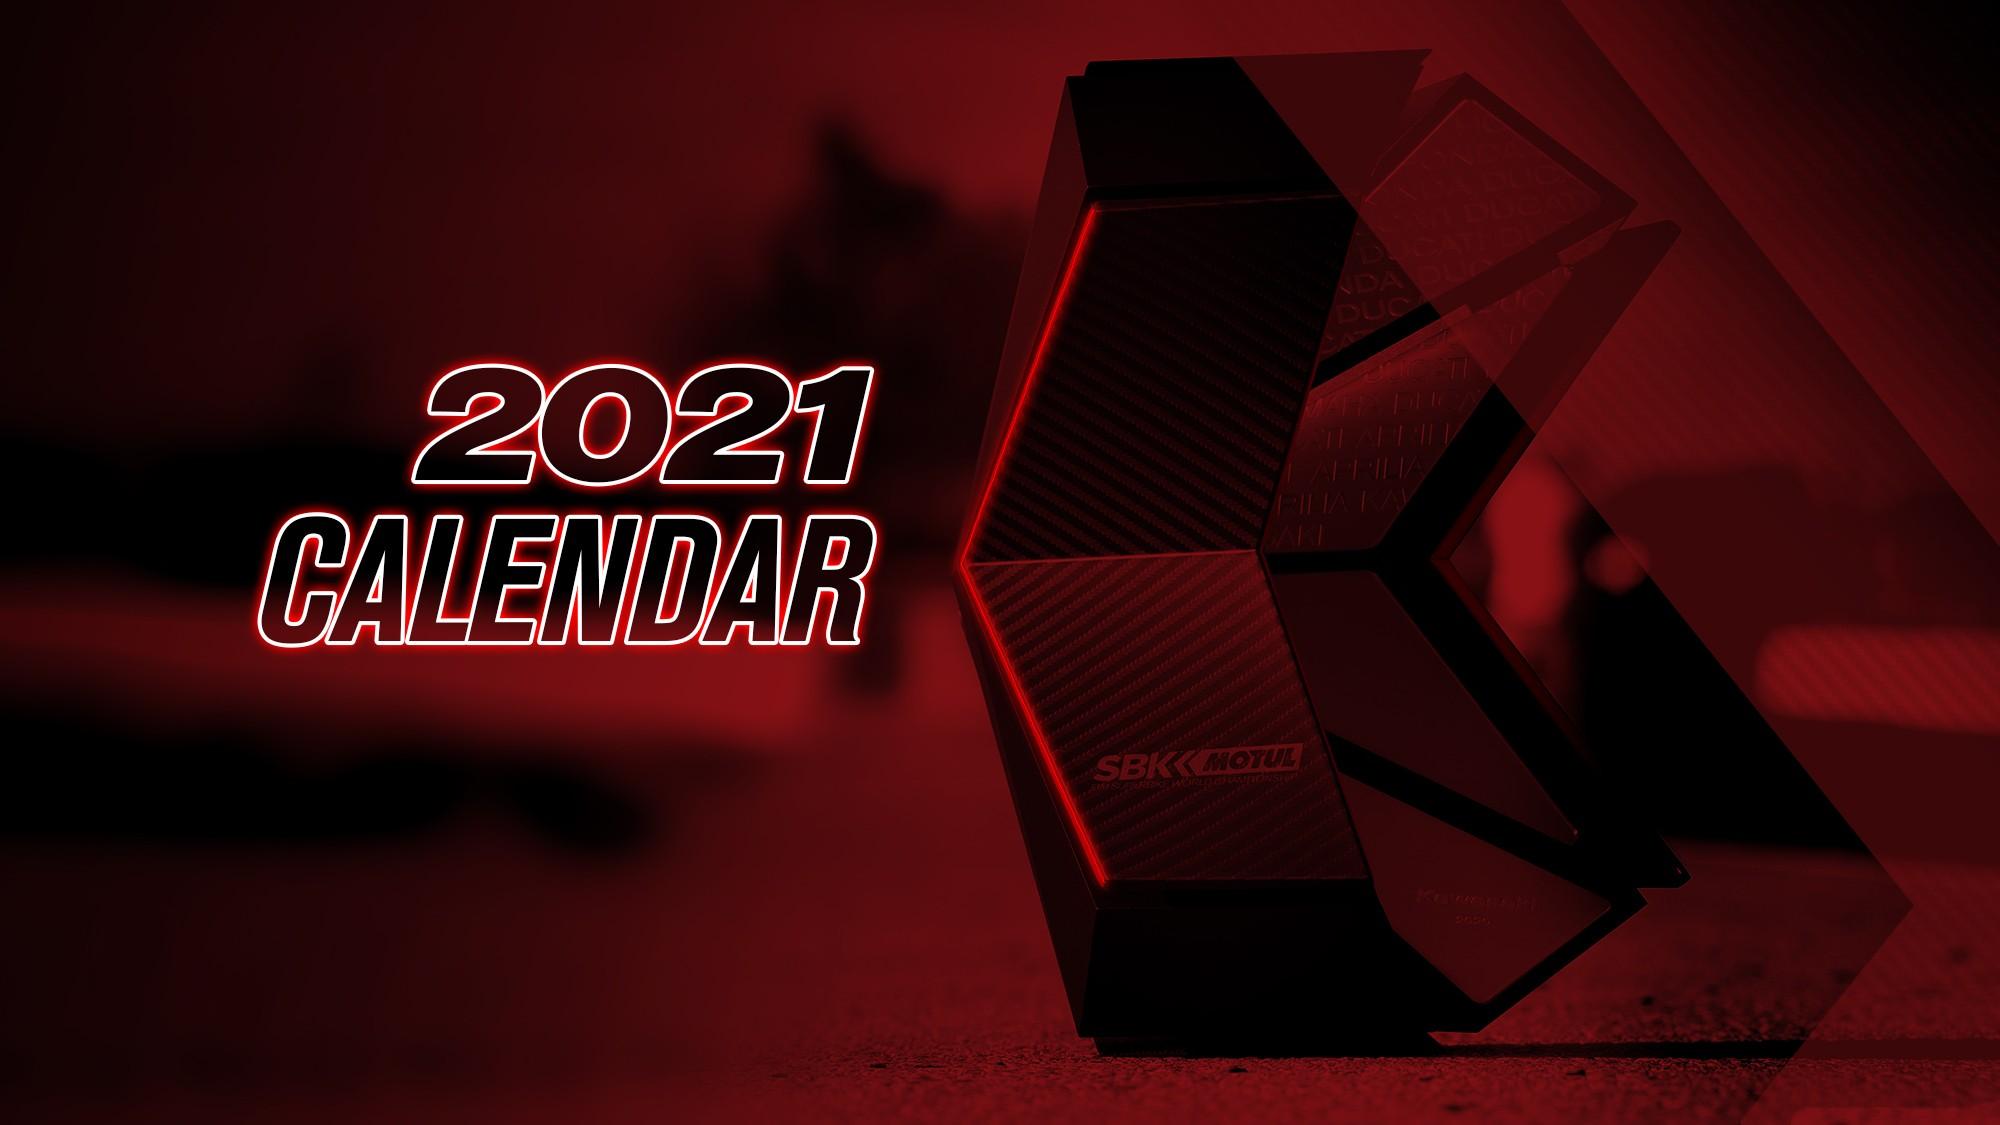 Calendrier Sbk 2022 WorldSBK